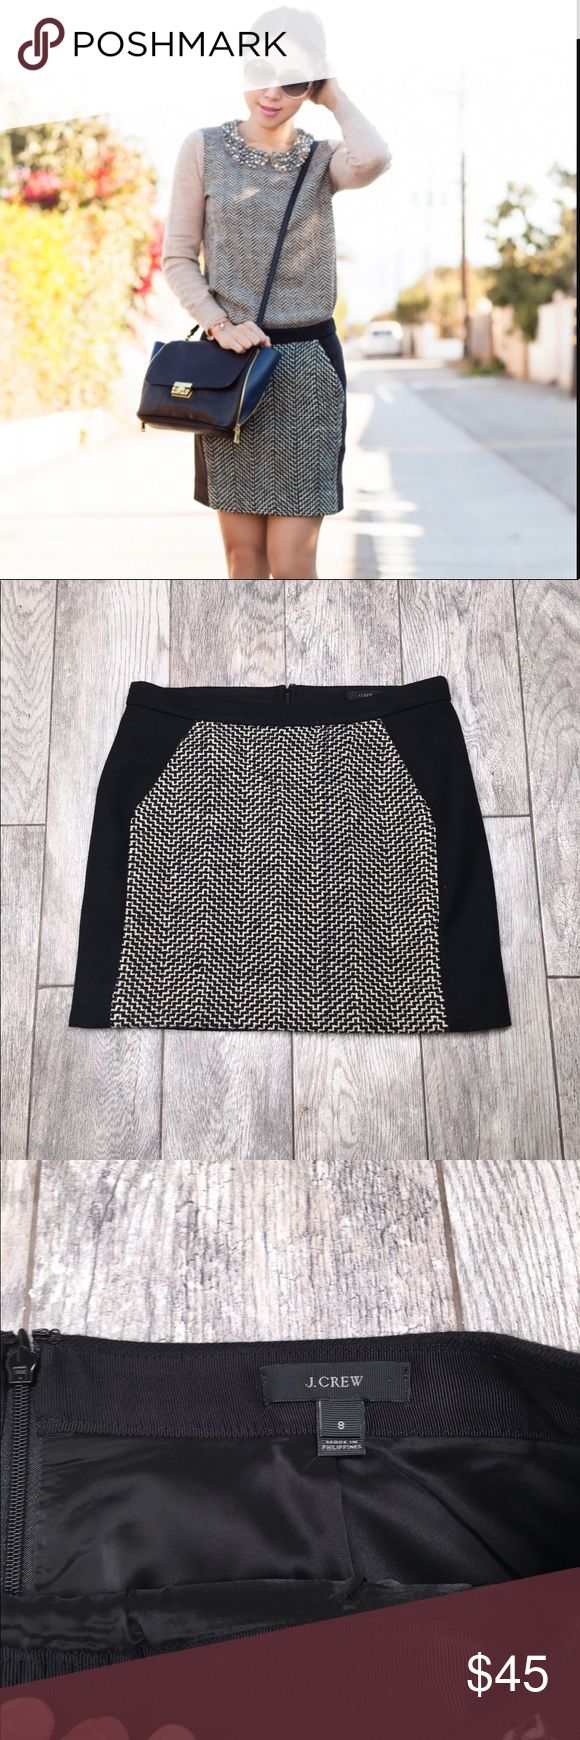 J crew black chevron postage stamp mini skirt J crew postage stamp skirt. Wool, back zip, lined and pockets. Chevron stripe tweed panel in front of skirt. Great skirt for winter! EUC- no flaws. Size 8 J. Crew Skirts Mini